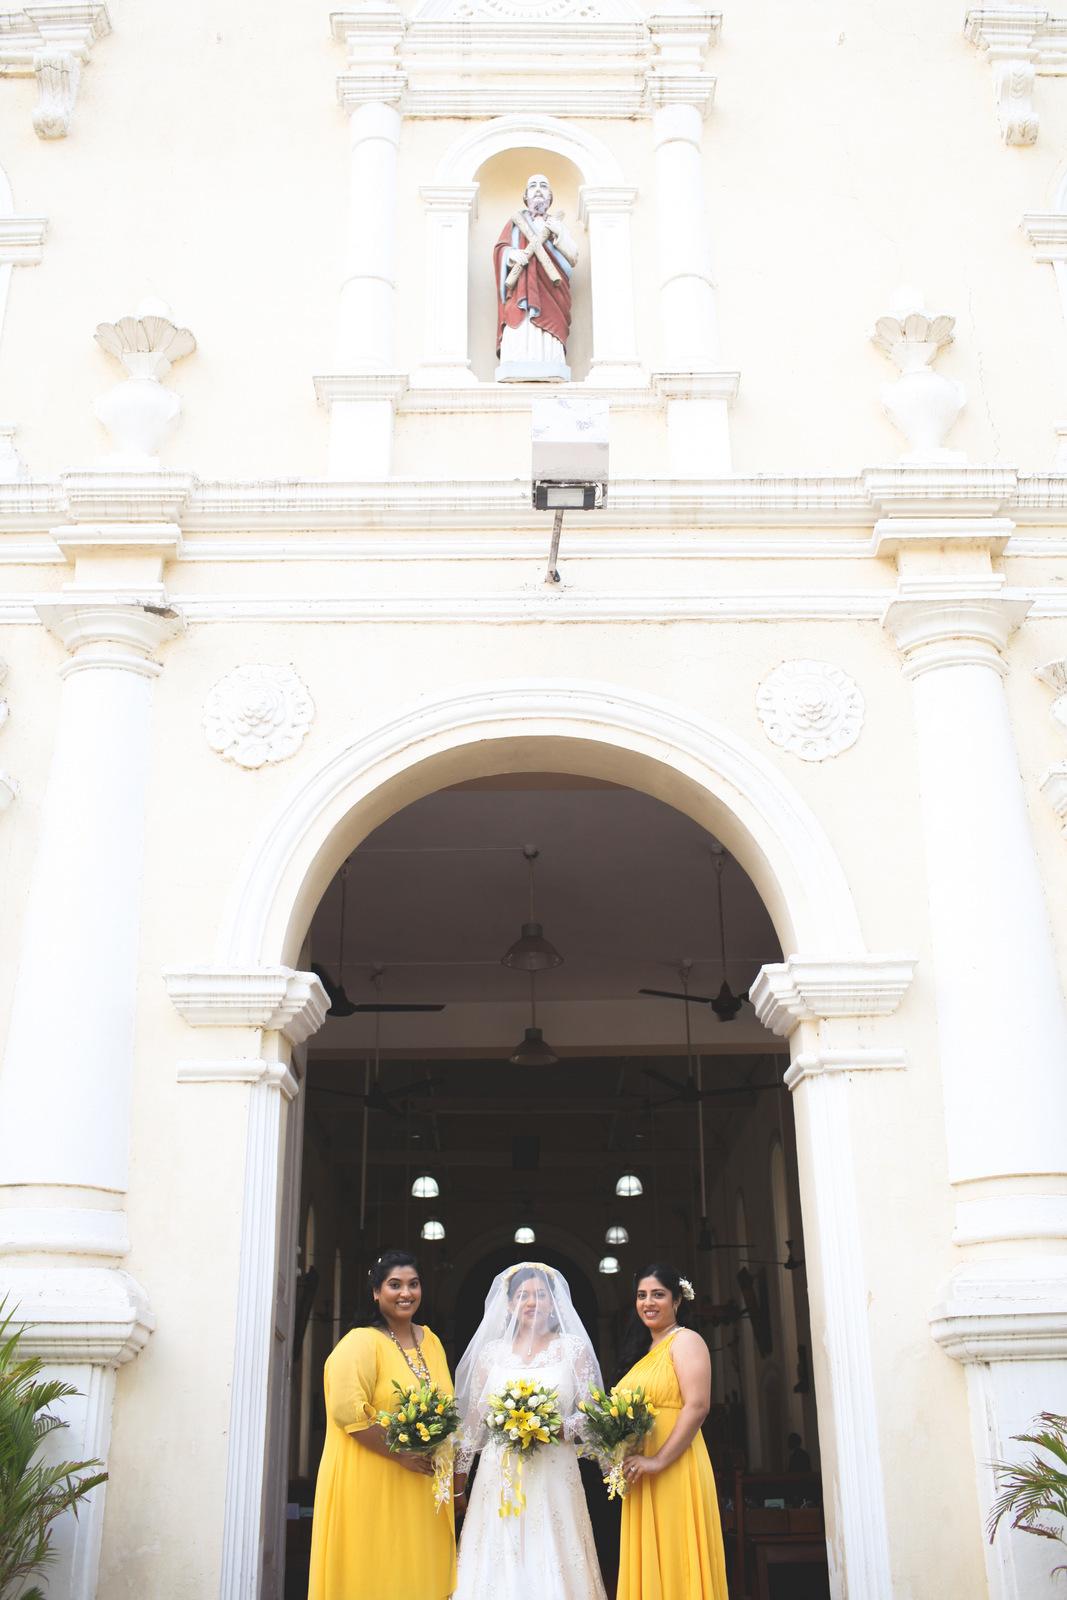 mumbai-wedding-into-candid-photography-rt-25.jpg